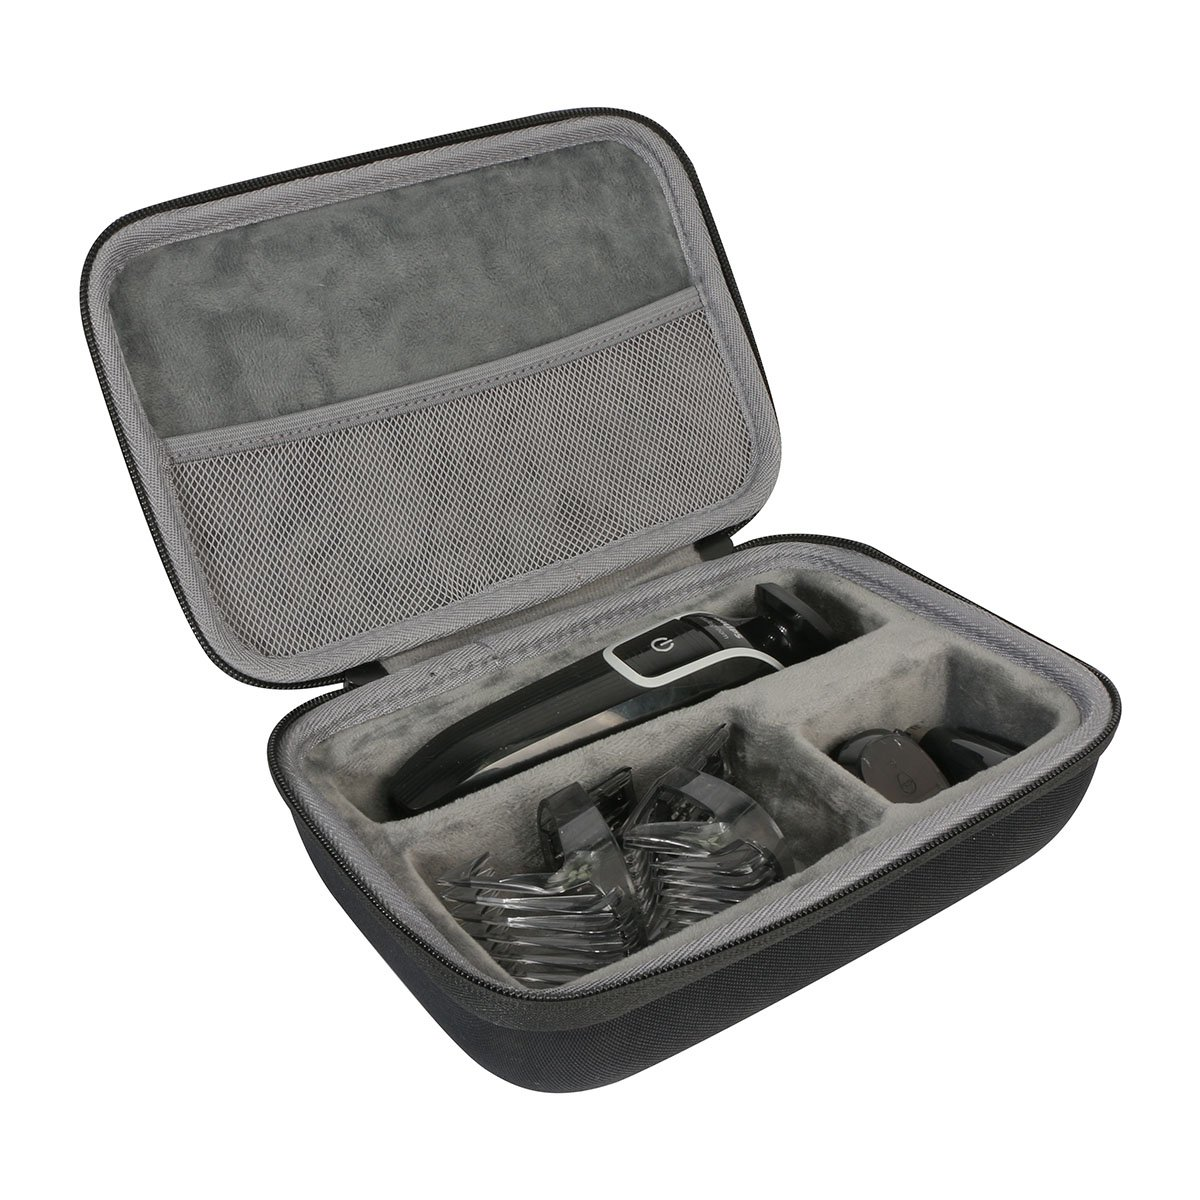 Hard Travel Case for Philips Norelco Multigroom 3100 / 5100 / 7100 QG3330/49 QG3364/49 QG3390 attachments Skin-friendly blades by co2CREA